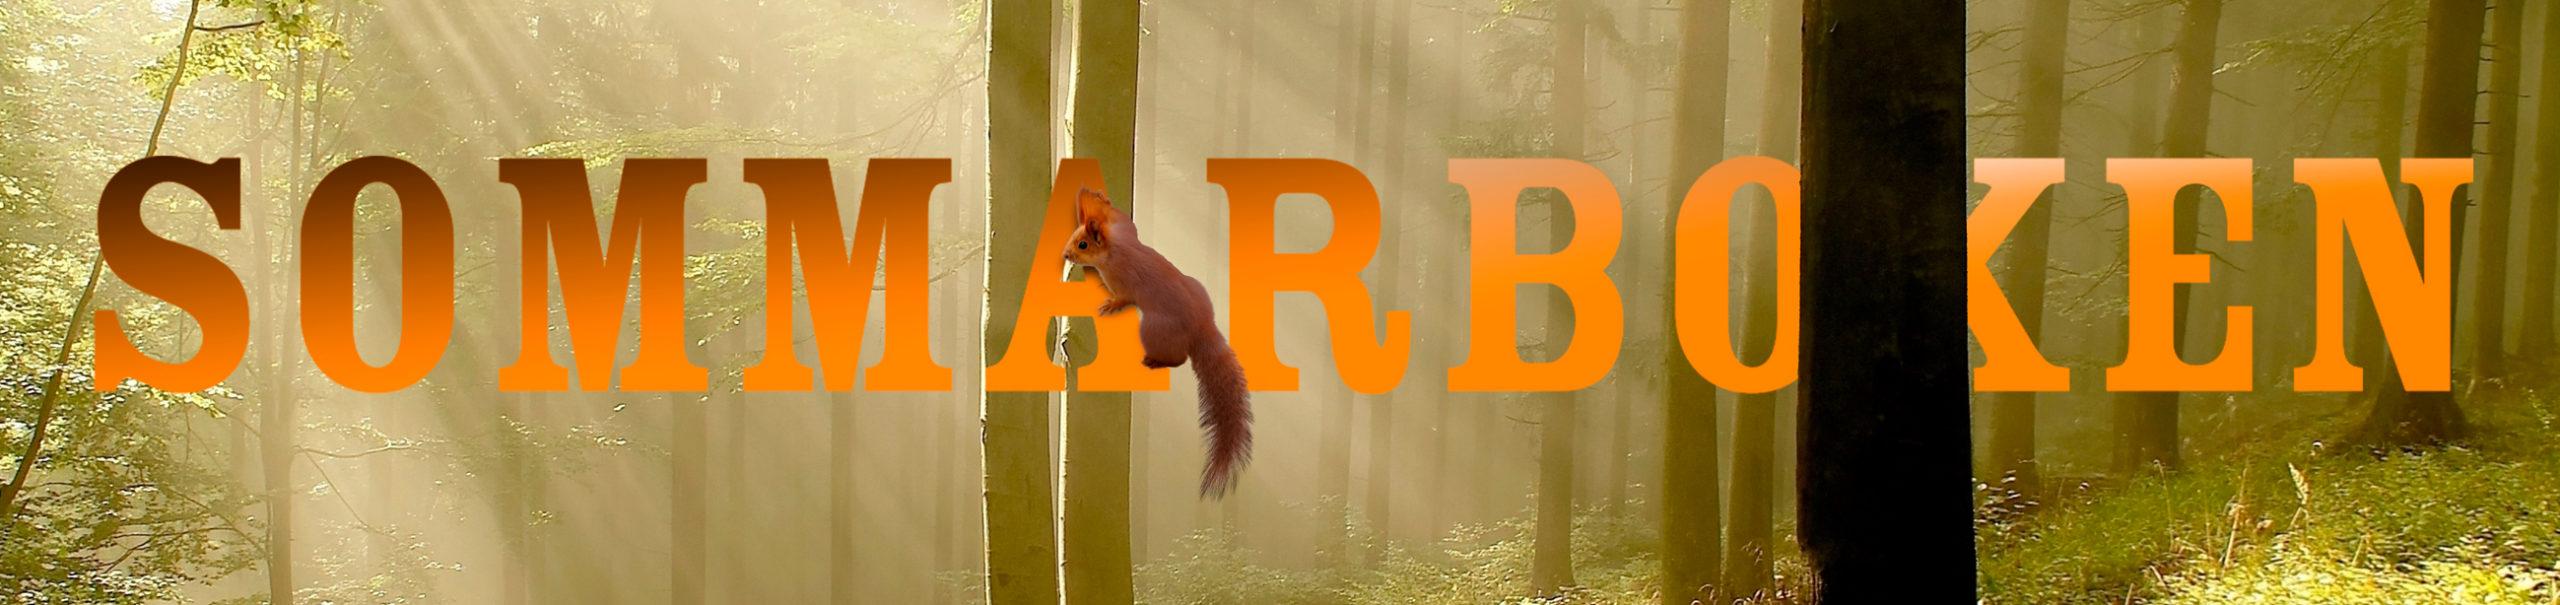 En ekorre i en skog med texten SOMMARBOKEN